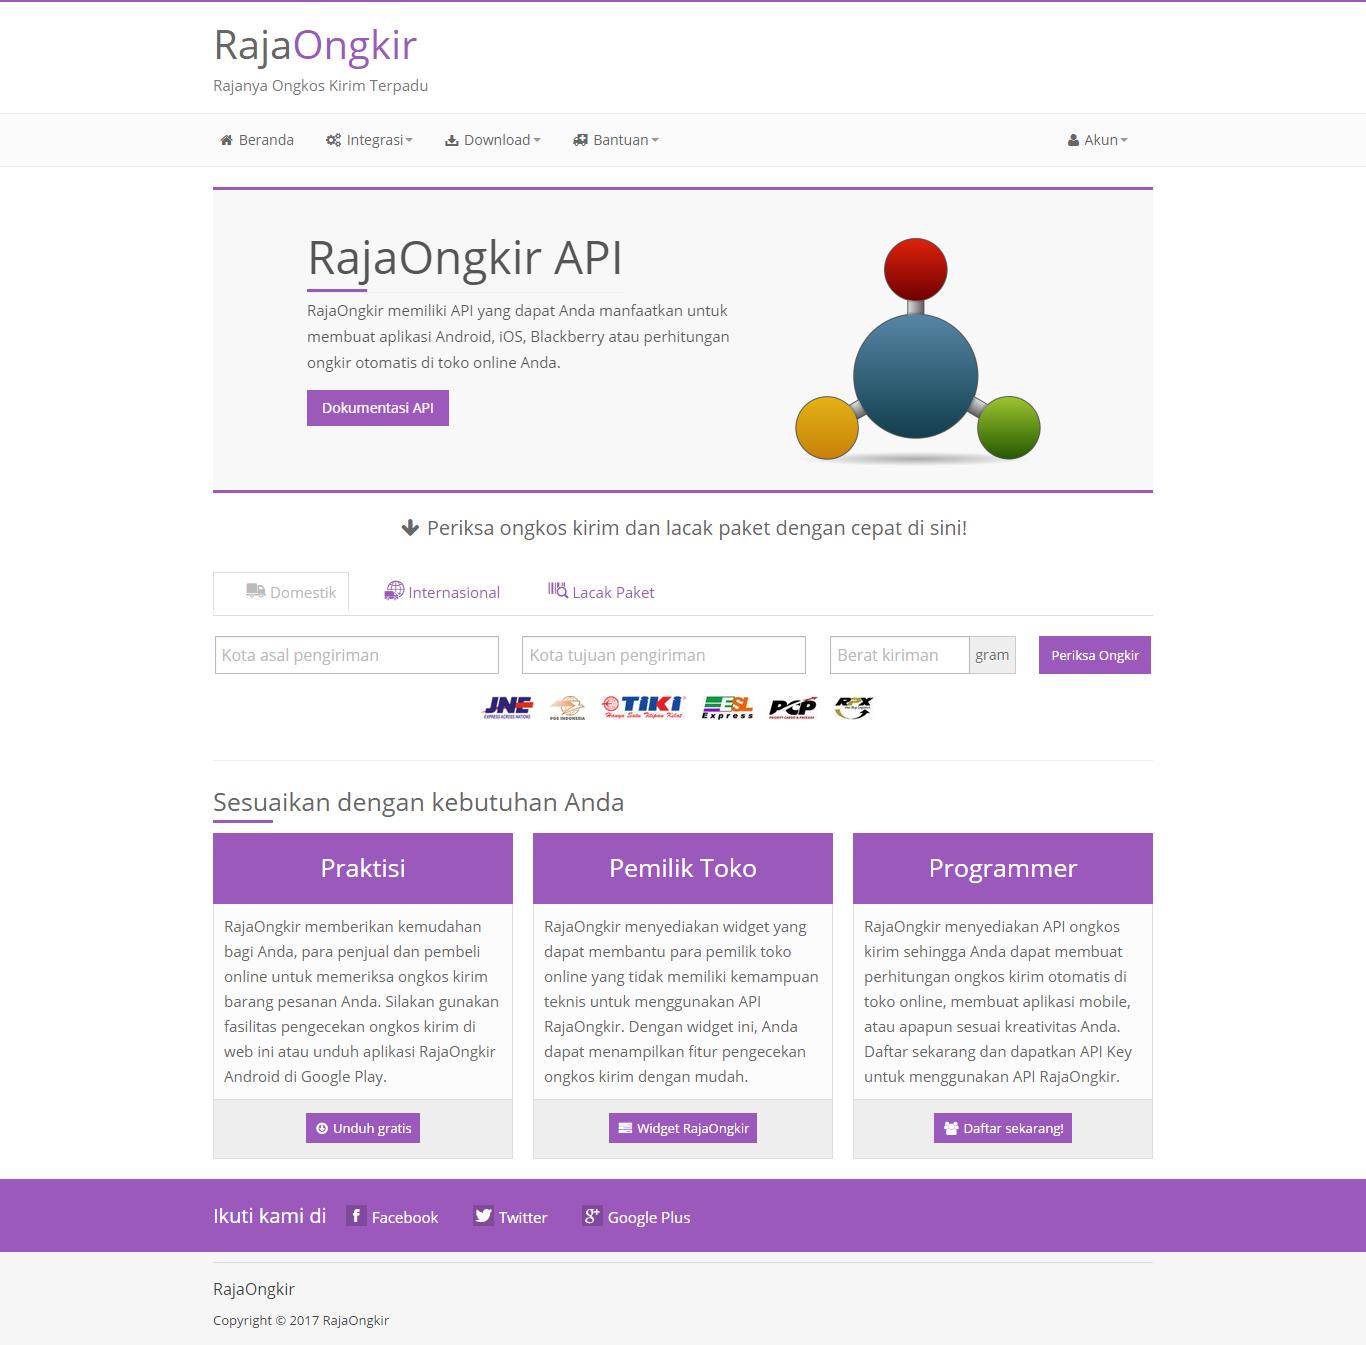 RajaOngkir API - Starter